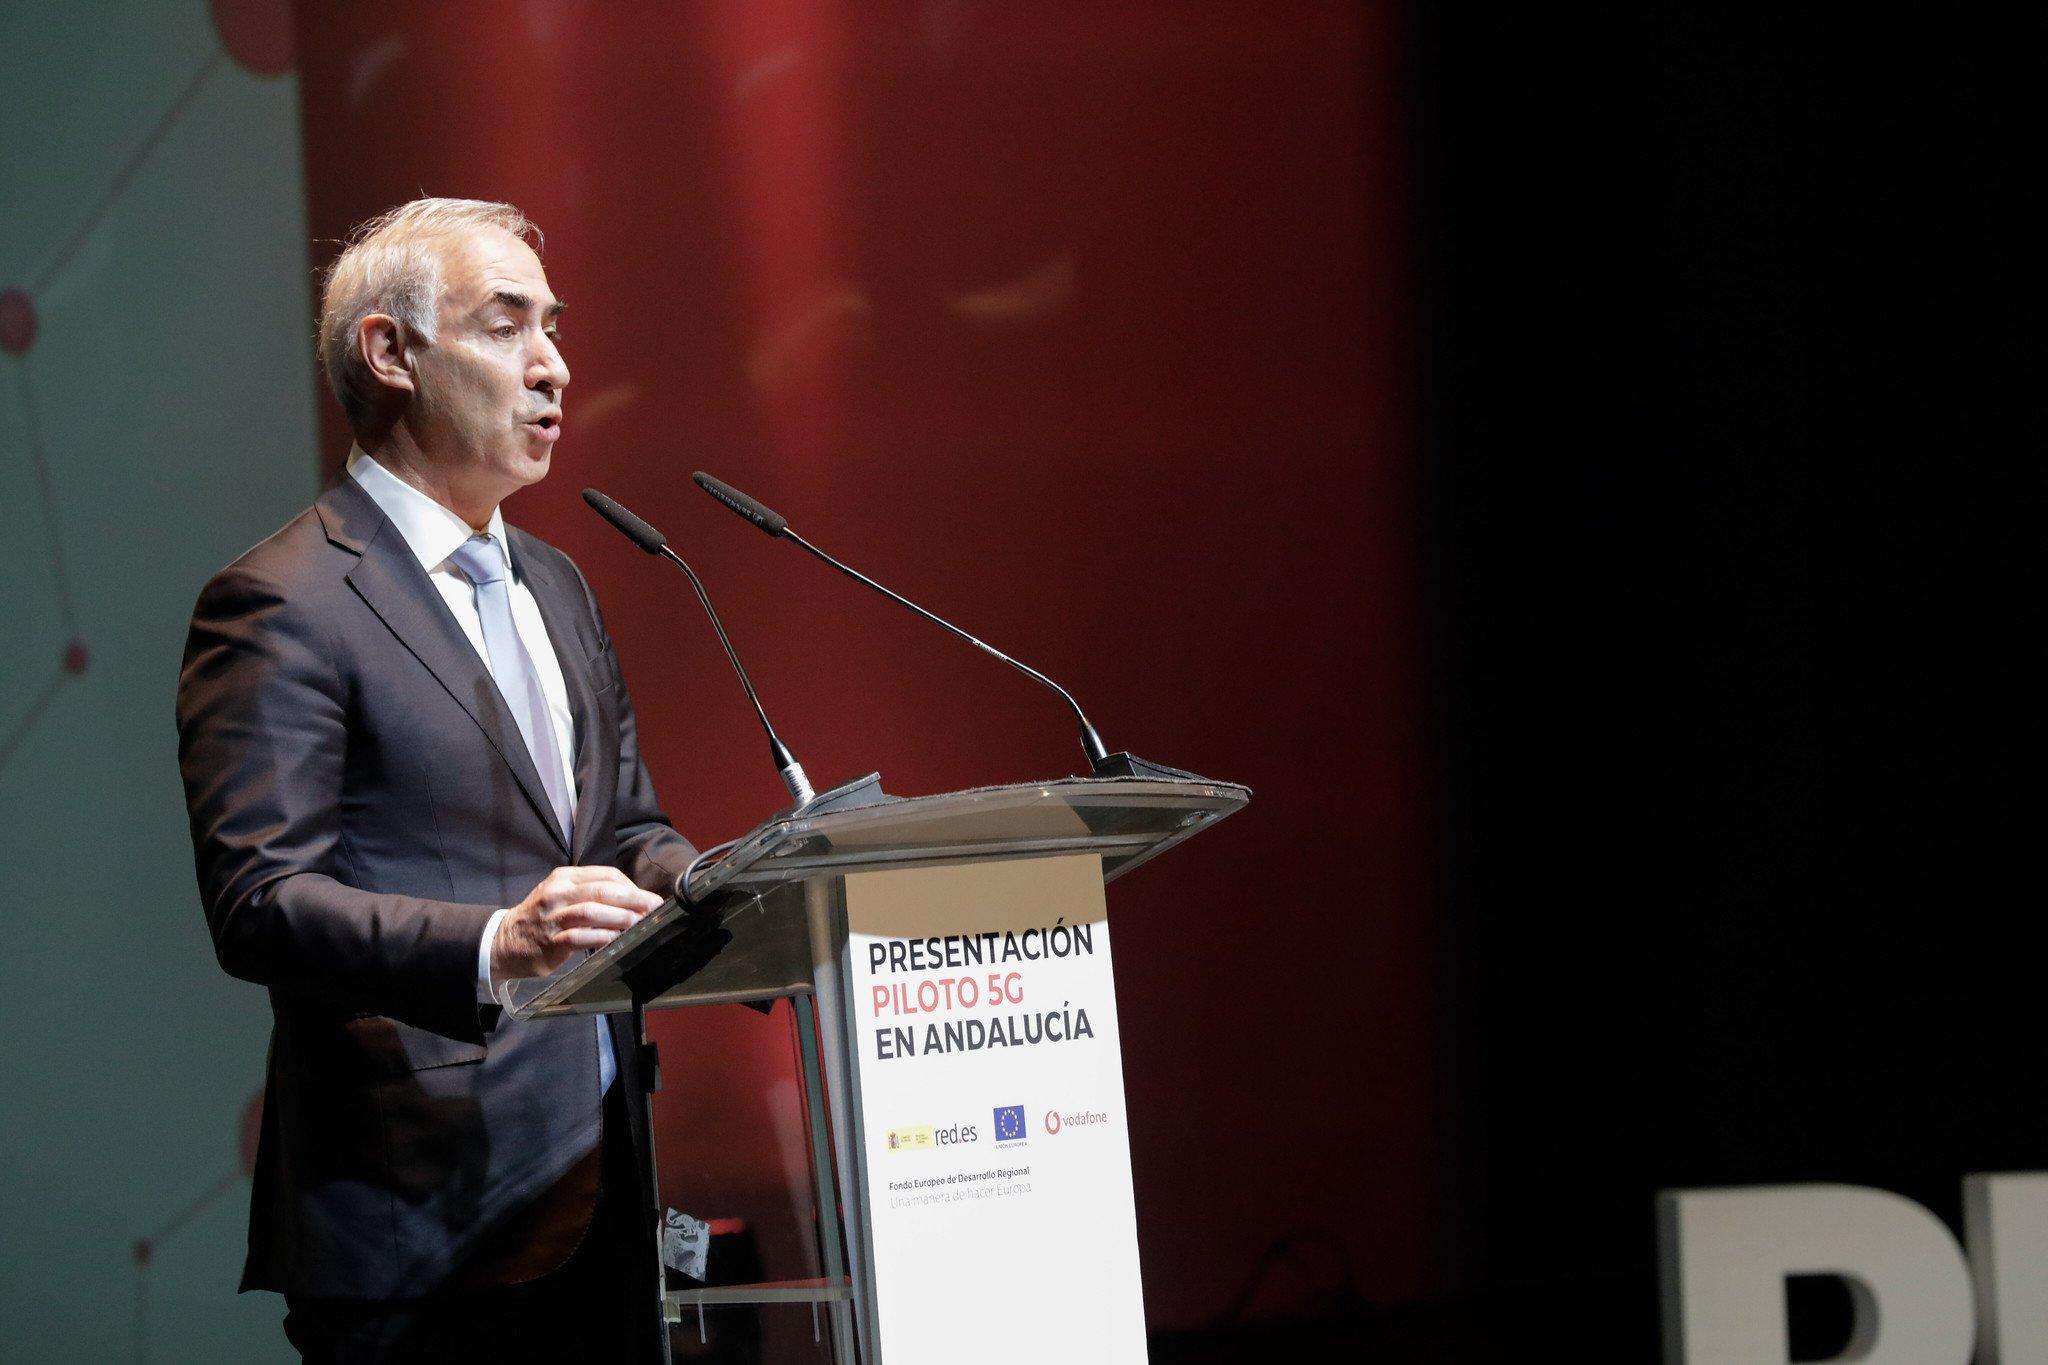 Antonio Coimbra, CEO de Vodafone España, confía en las medidas adoptadas durante 2019